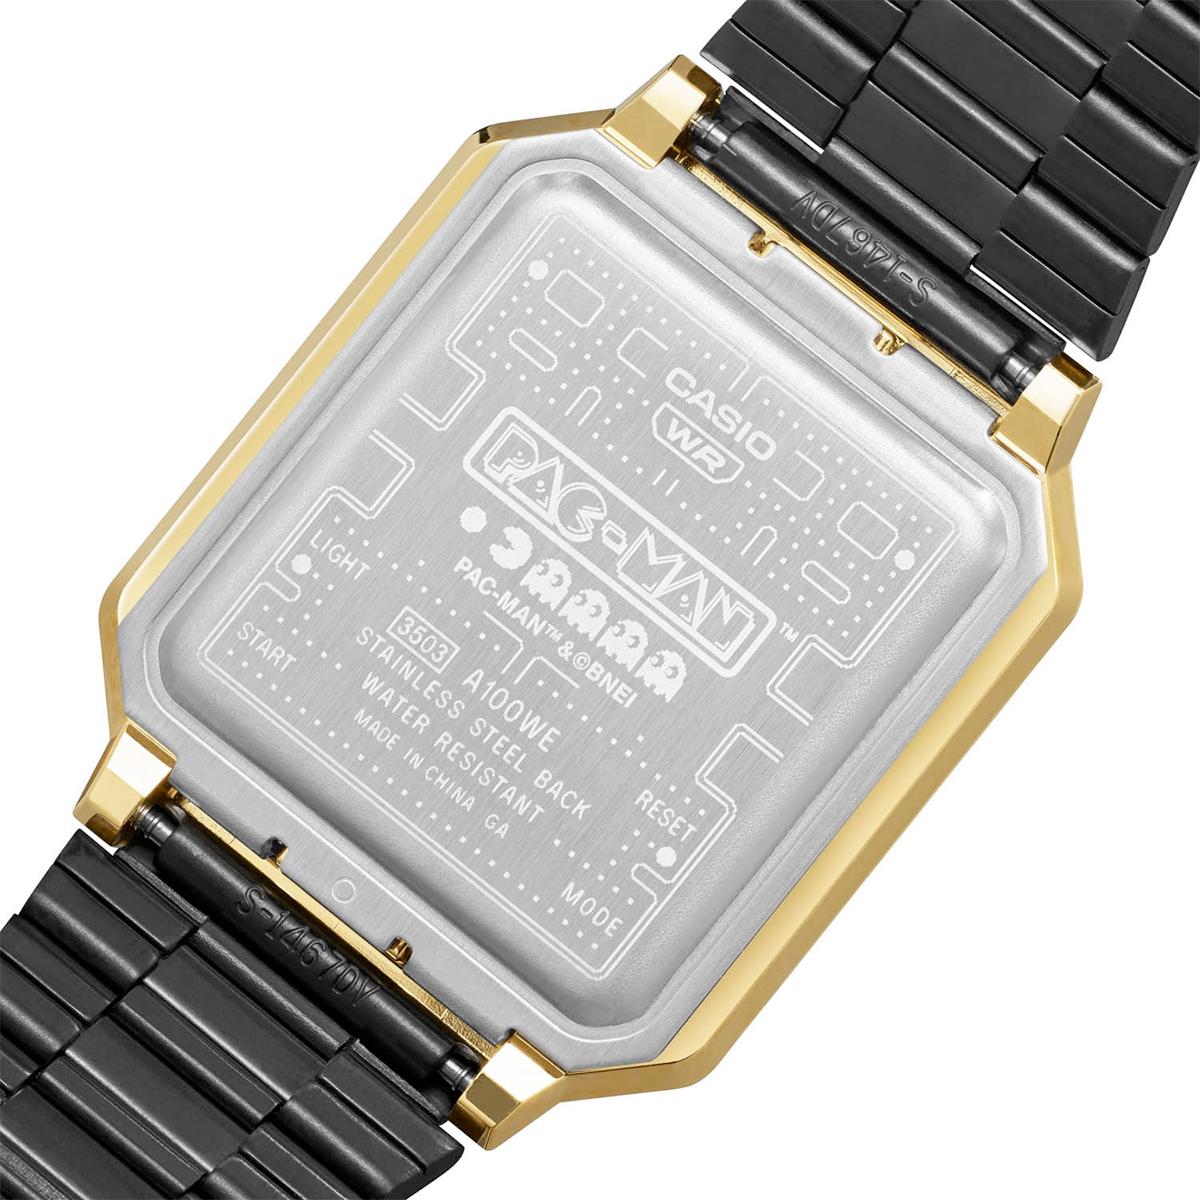 Casio Vintage Pac-Man Edition A100WEPC Watch